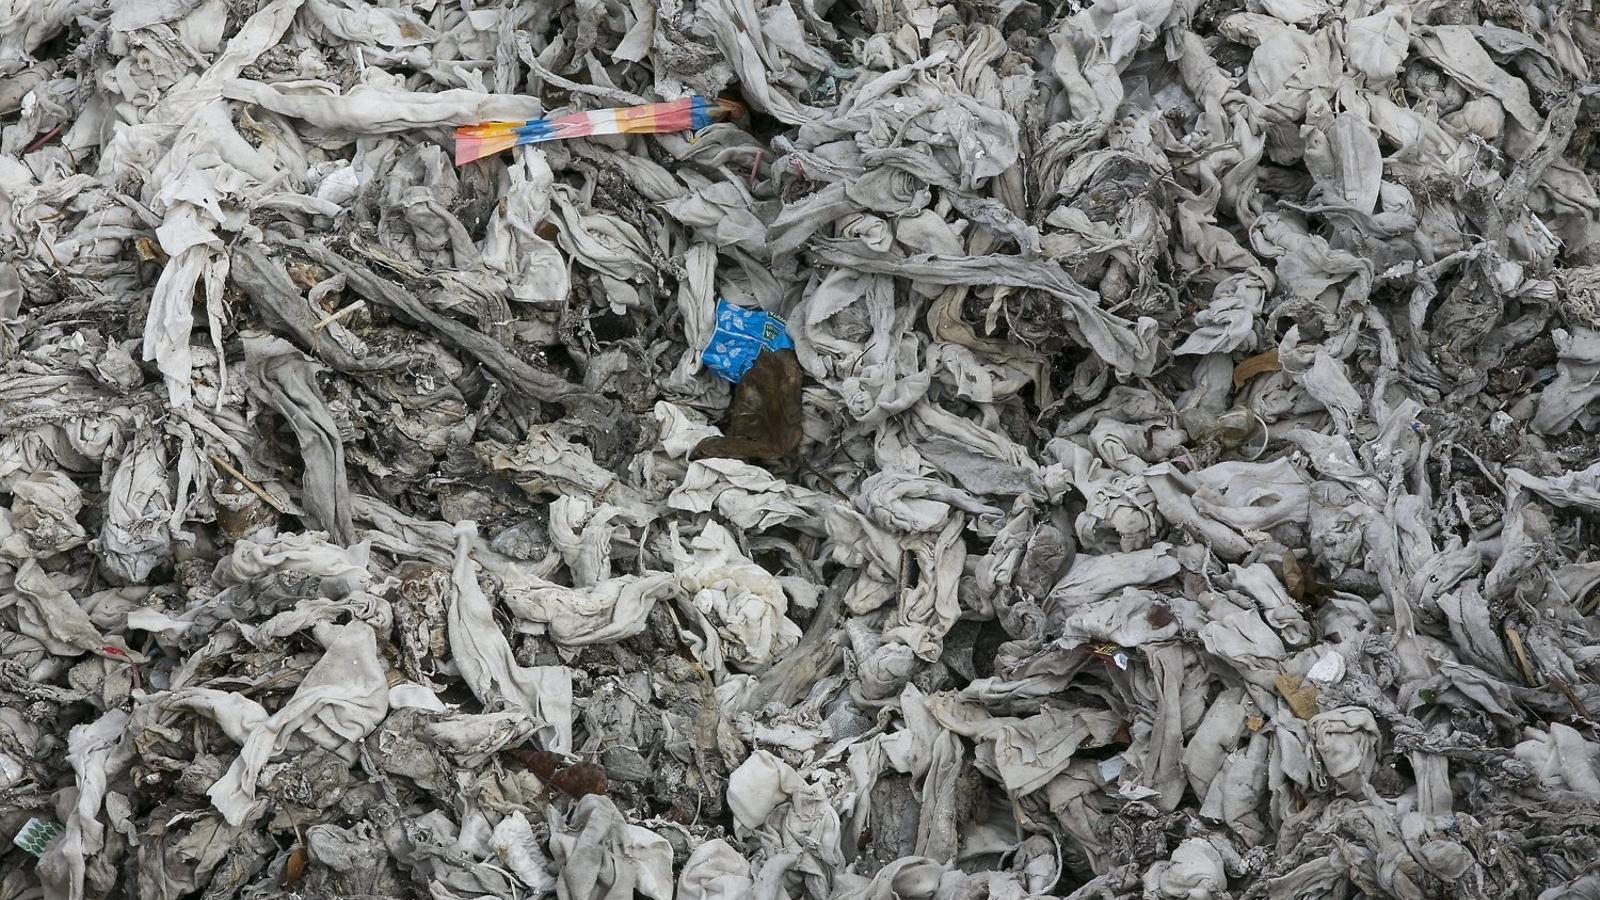 Tovalloletes humides: el monstre que col·lapsa les canonades